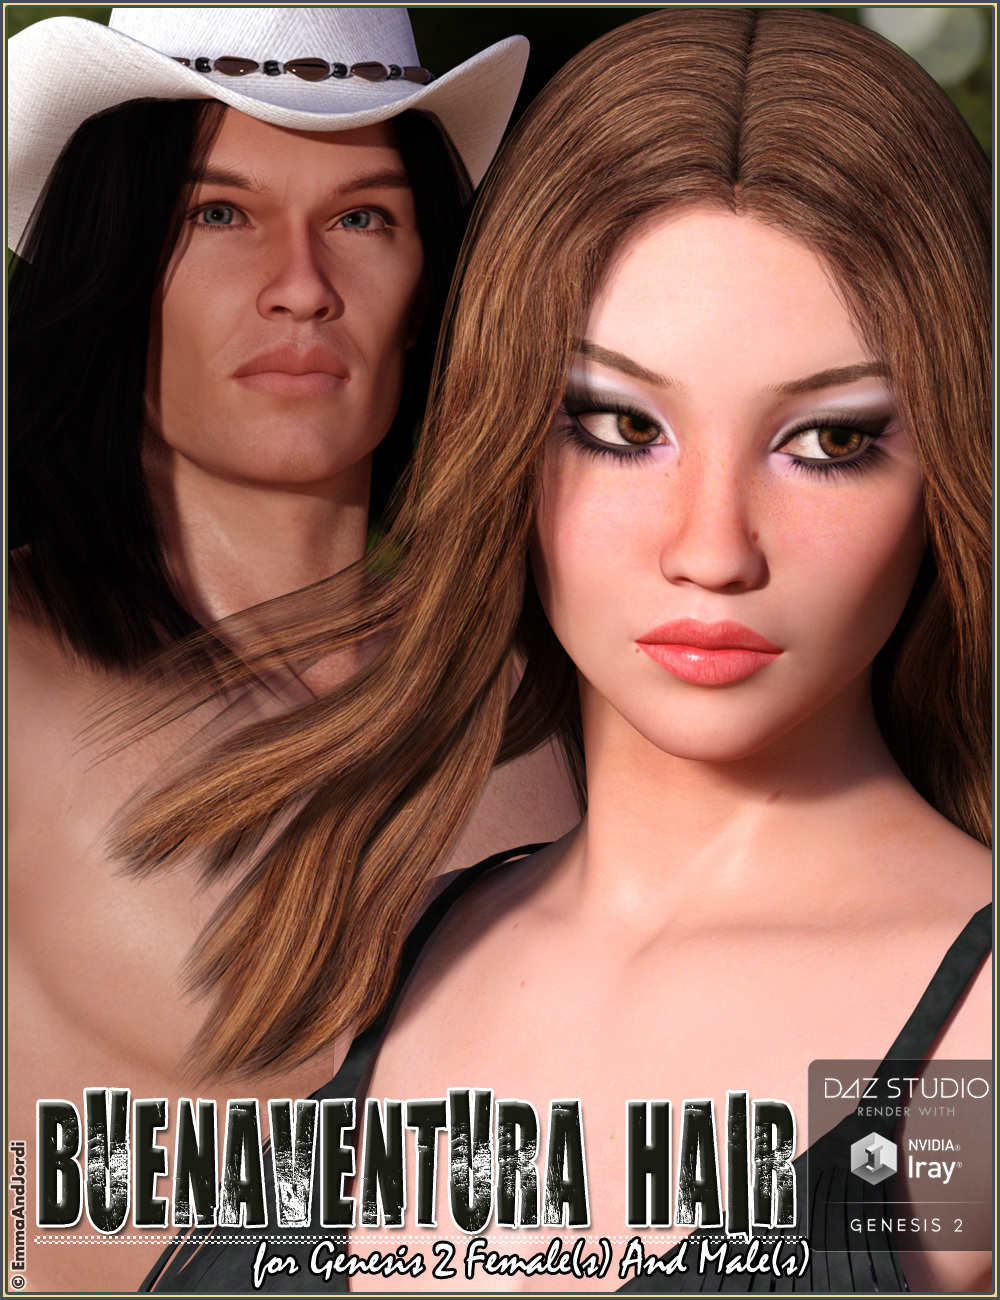 Buenaventura Hair For Genesis 2 Female(s) and Male(s) by: EmmaAndJordi, 3D Models by Daz 3D